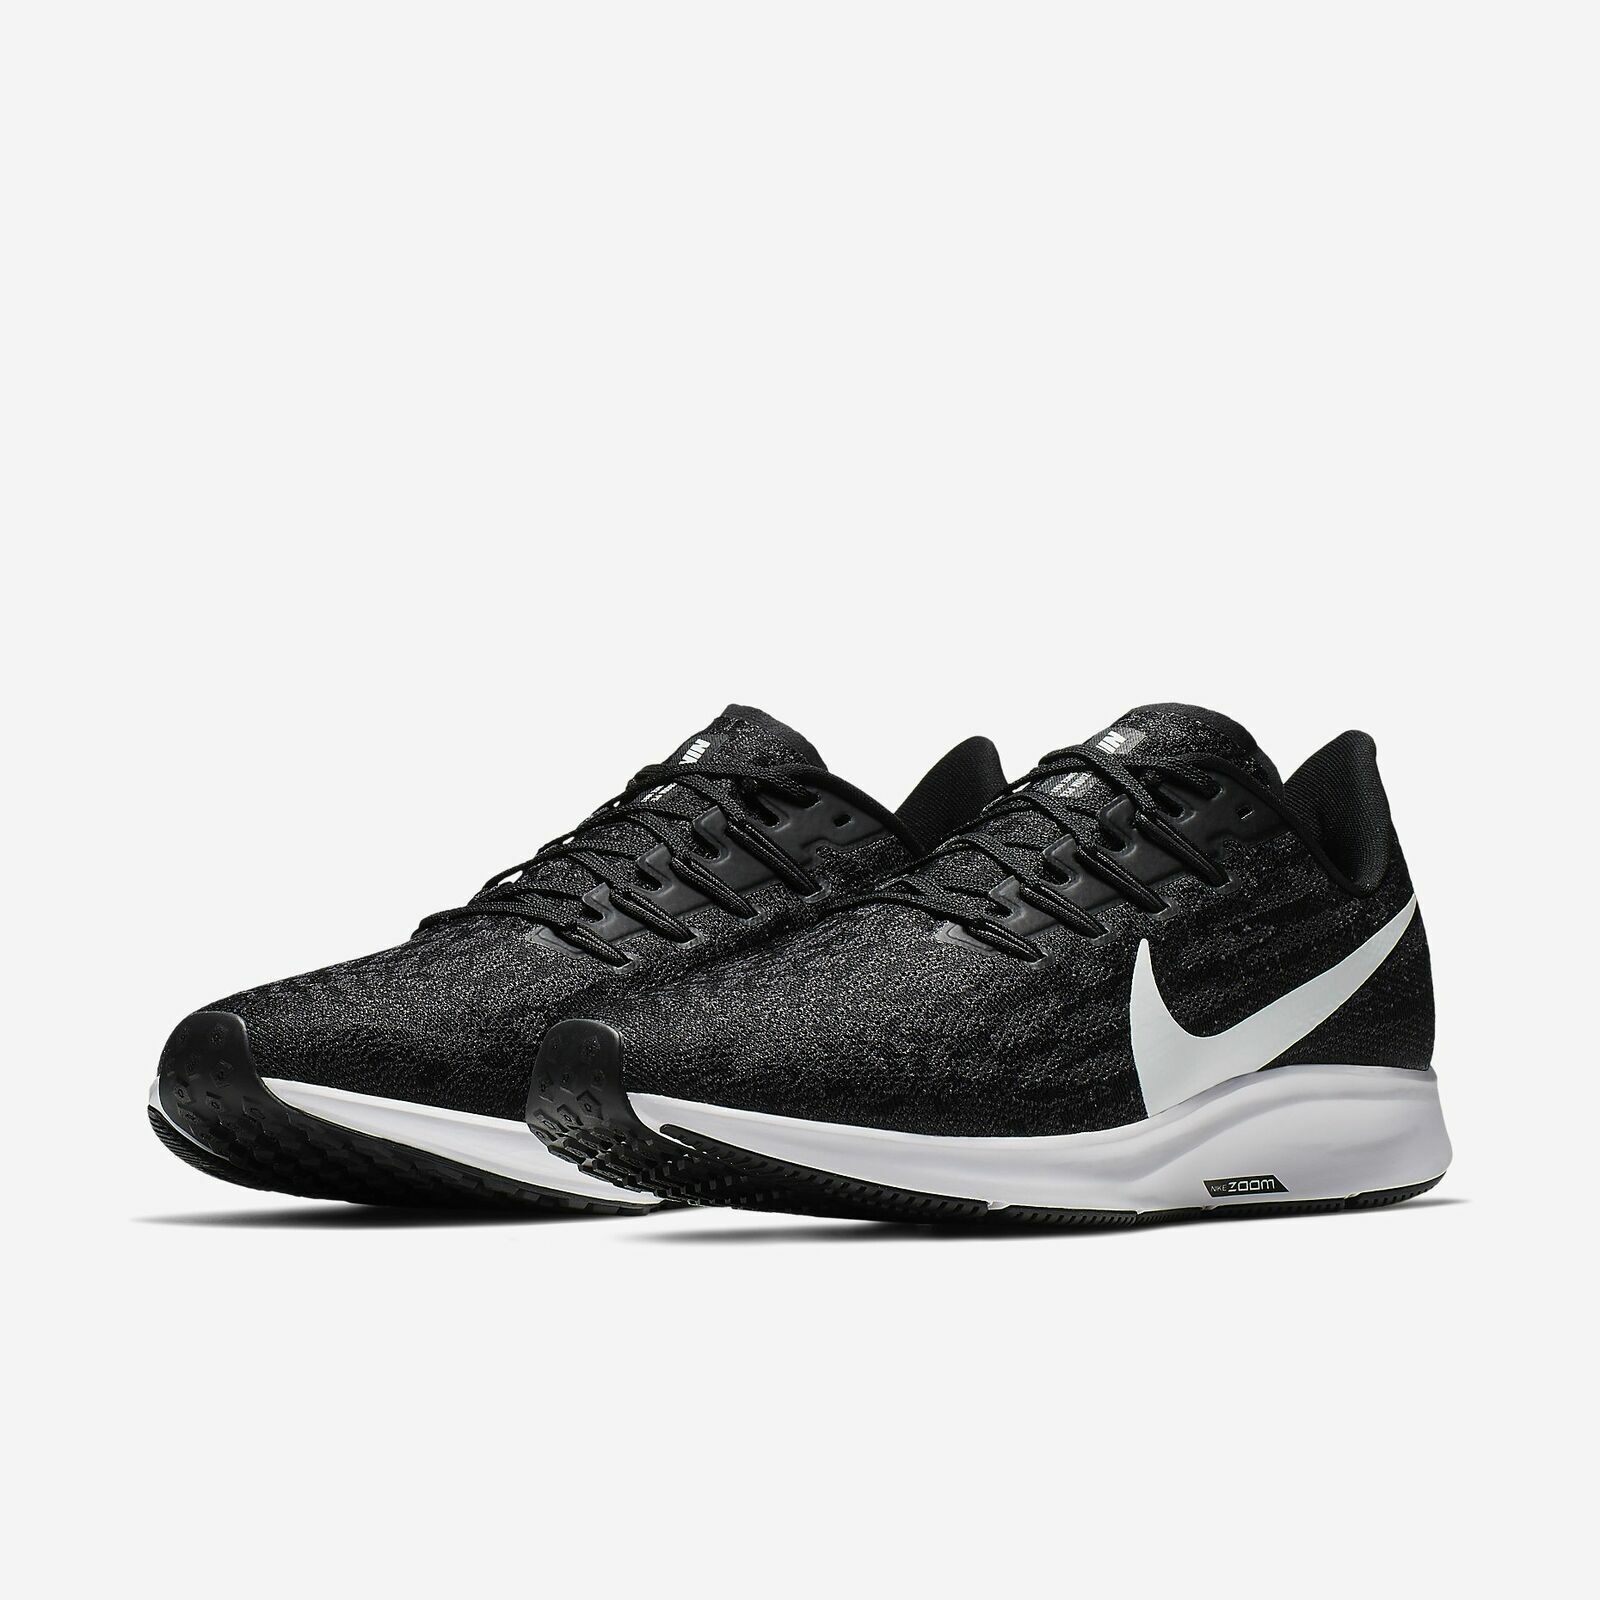 quality design 03b9c 27d96 Nike Air Zoom Pegasus 36 Running Shoes Black White Gray AQ2203-002 Men's NEW